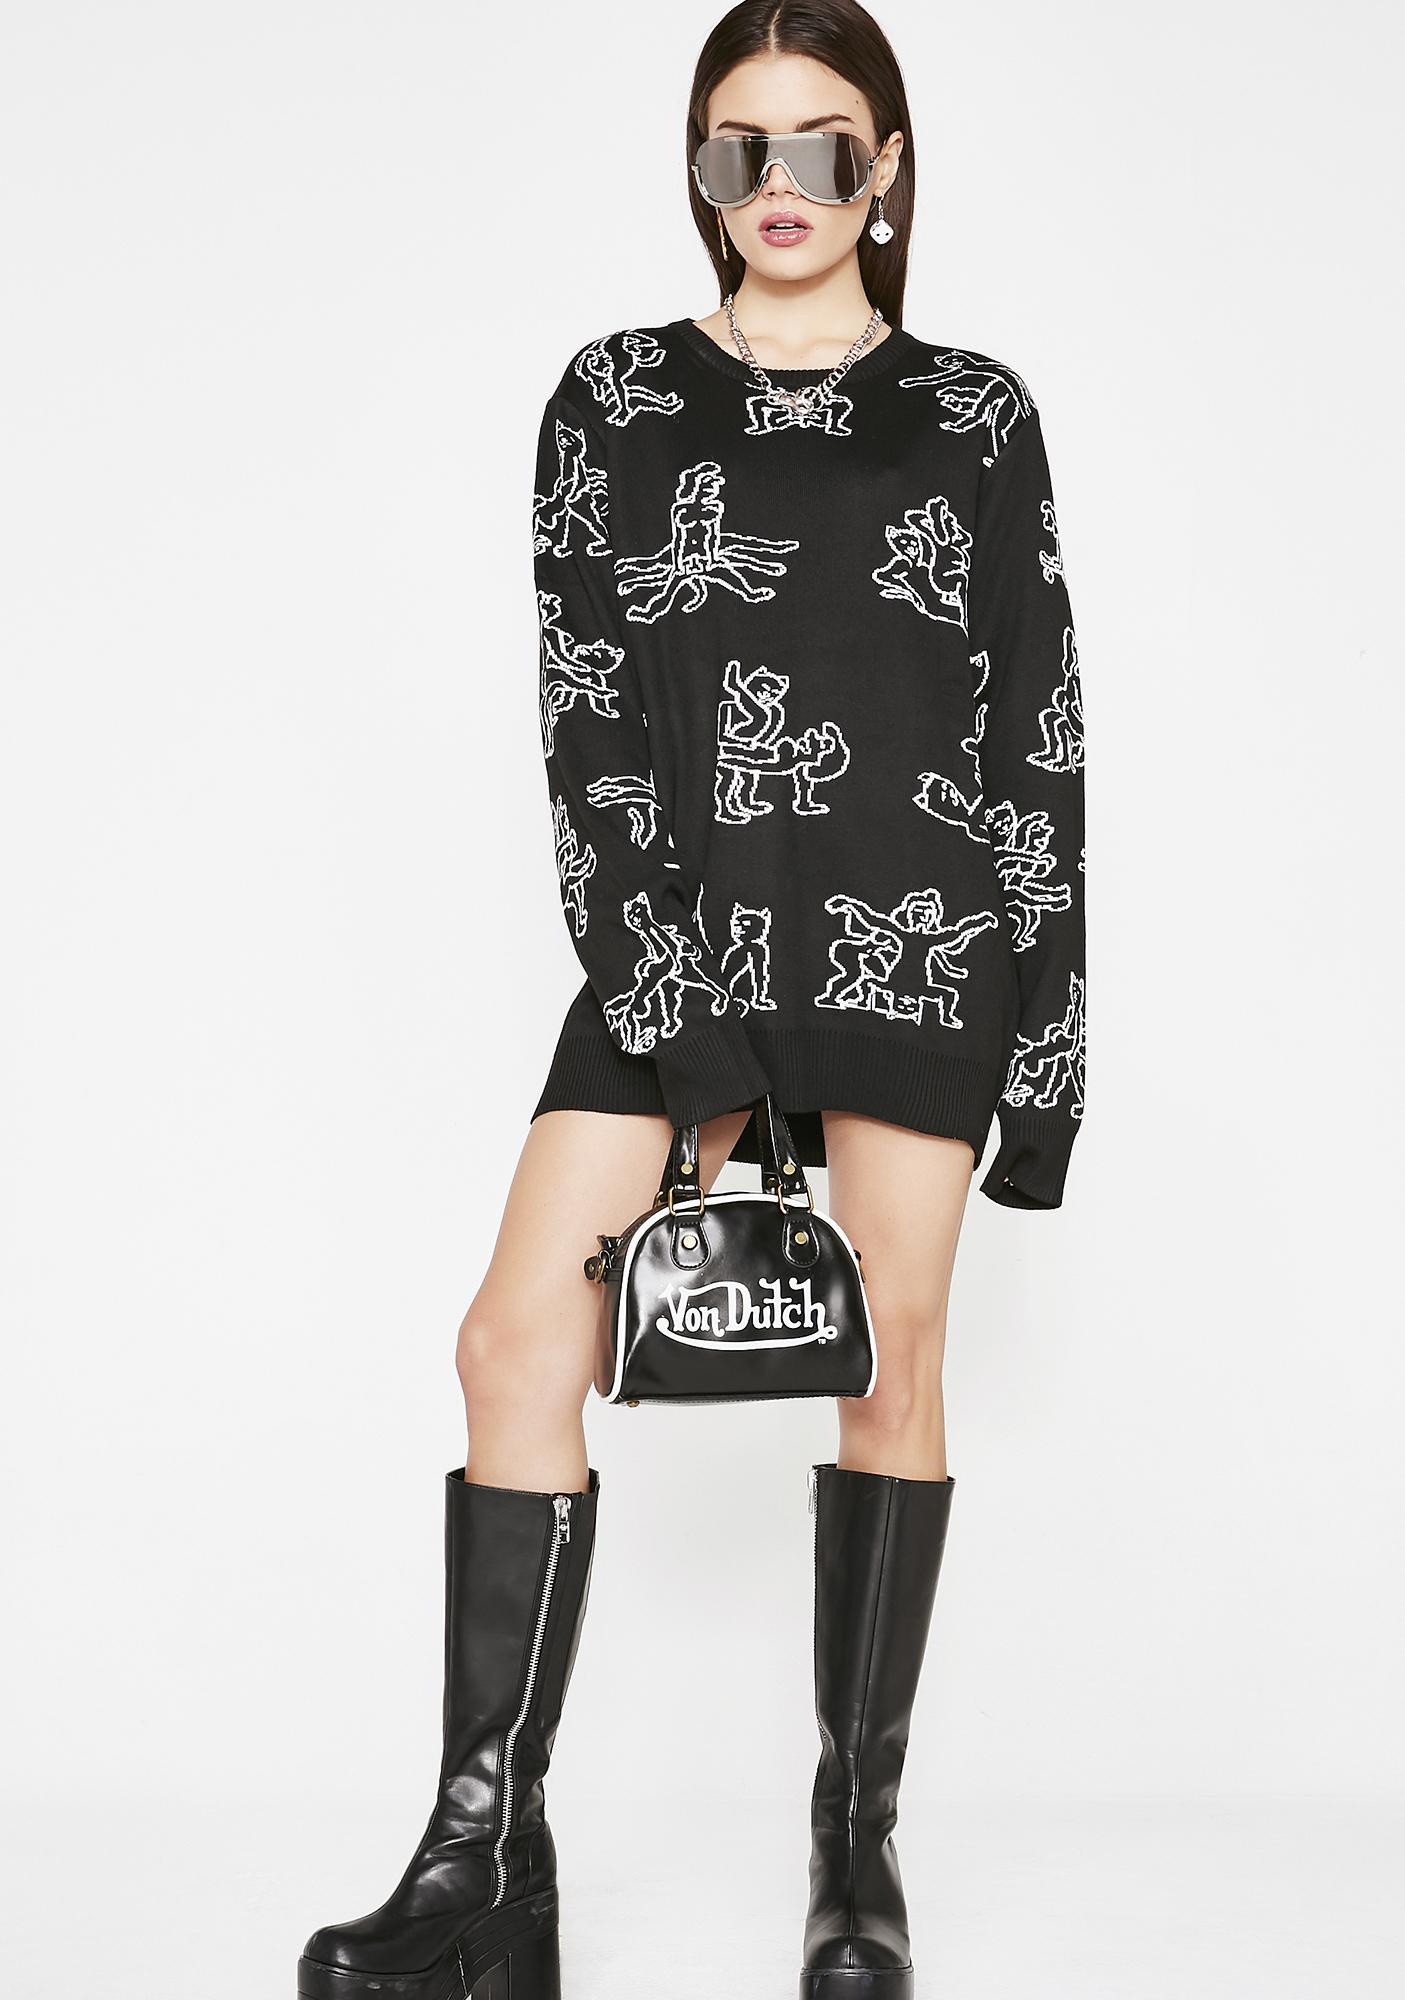 RIPNDIP Nermasutra Knit Sweater